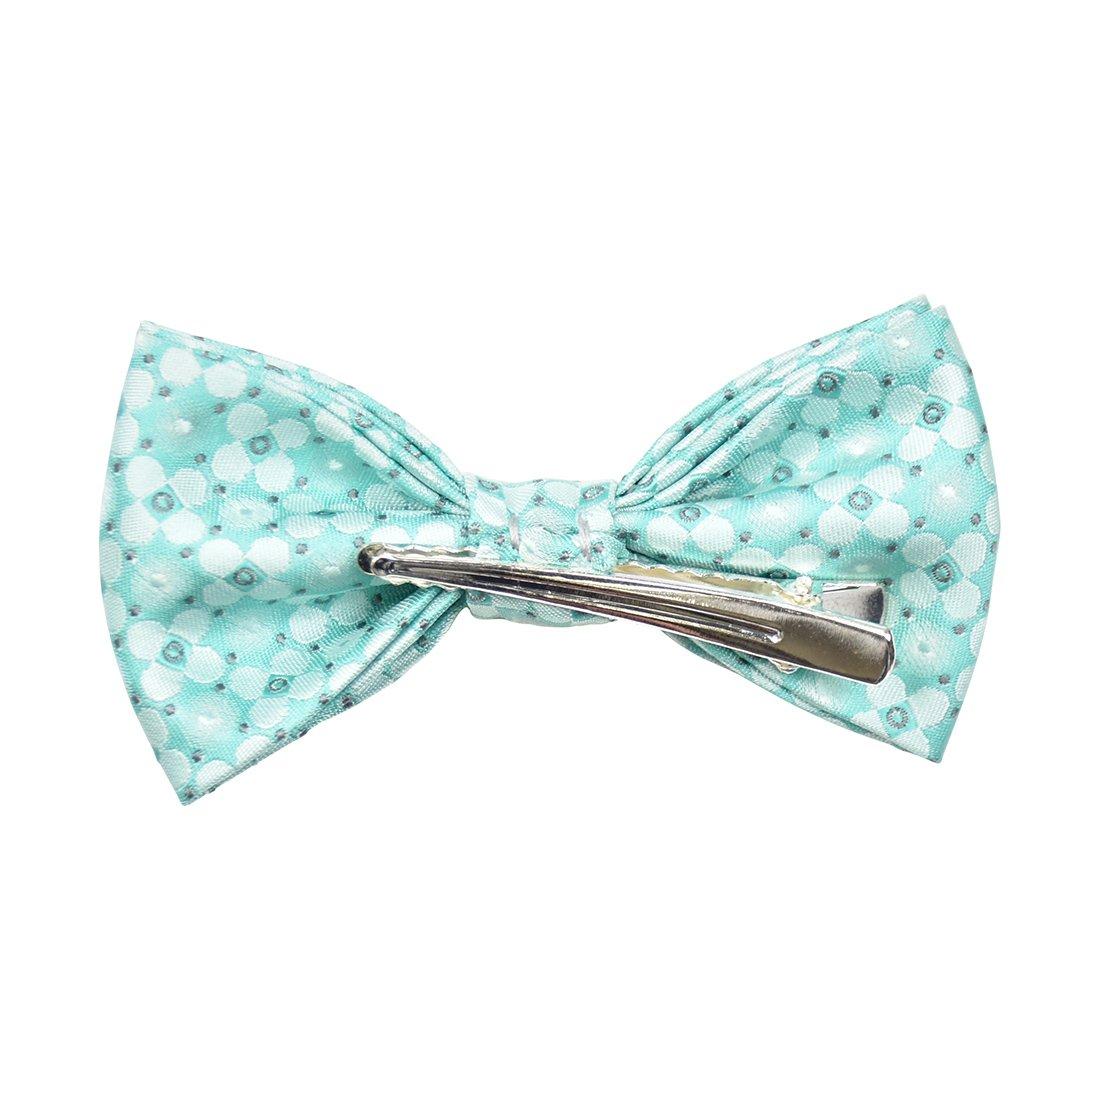 Floral Satin Clip-On Bow Tie AGBT0035NV